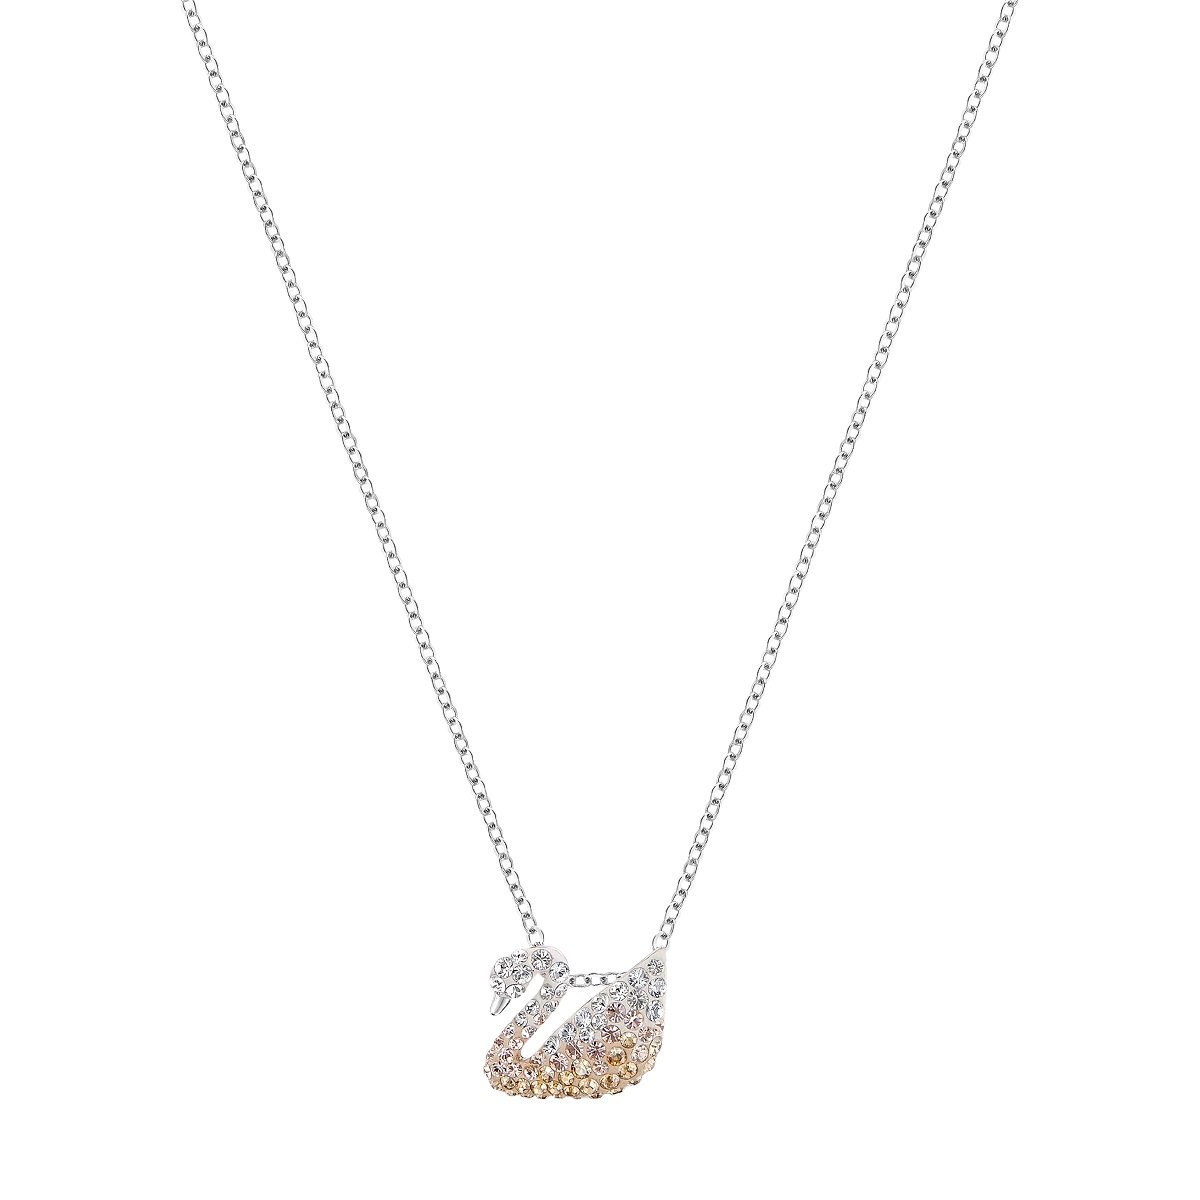 Swarovski Iconic Swan Pendant - 5215038